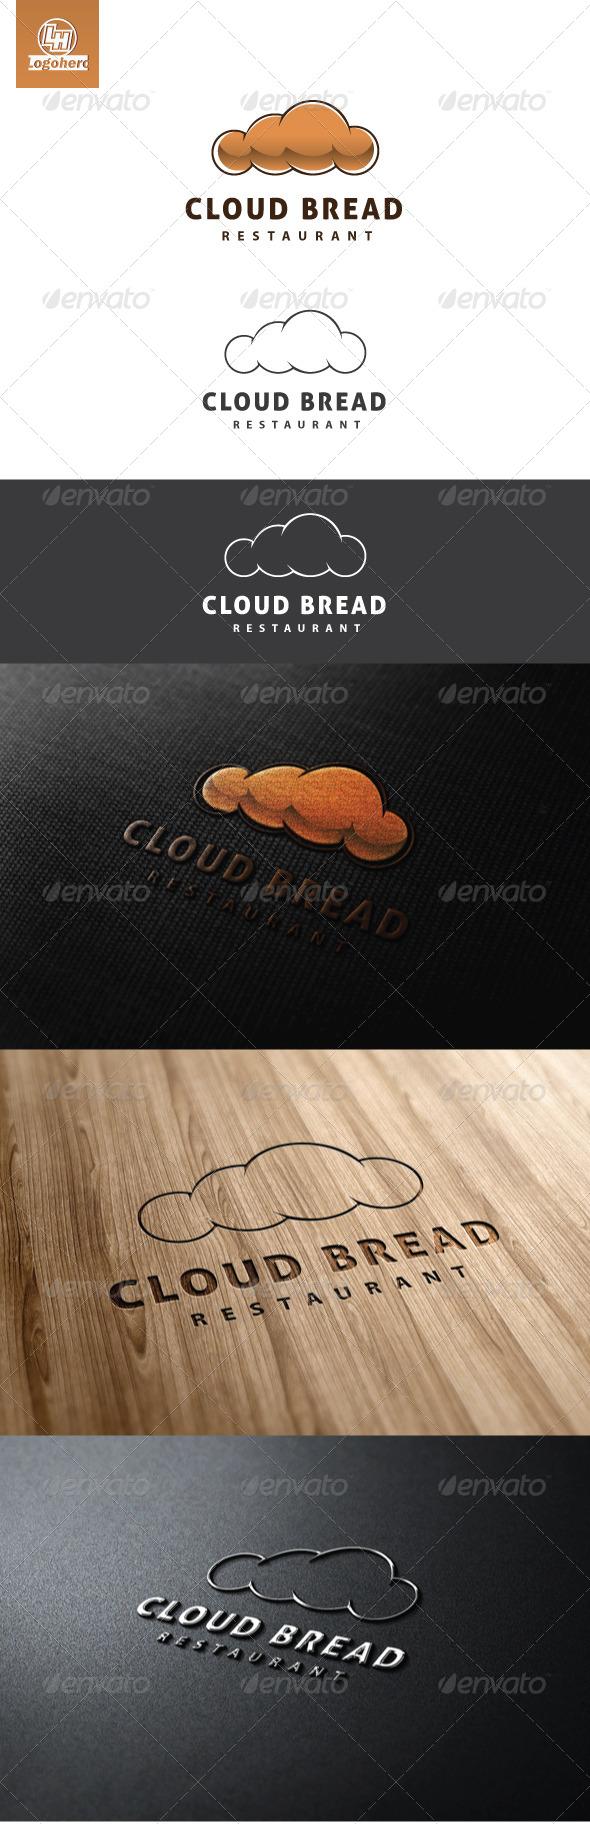 Cloud Bread Logo Template - Food Logo Templates